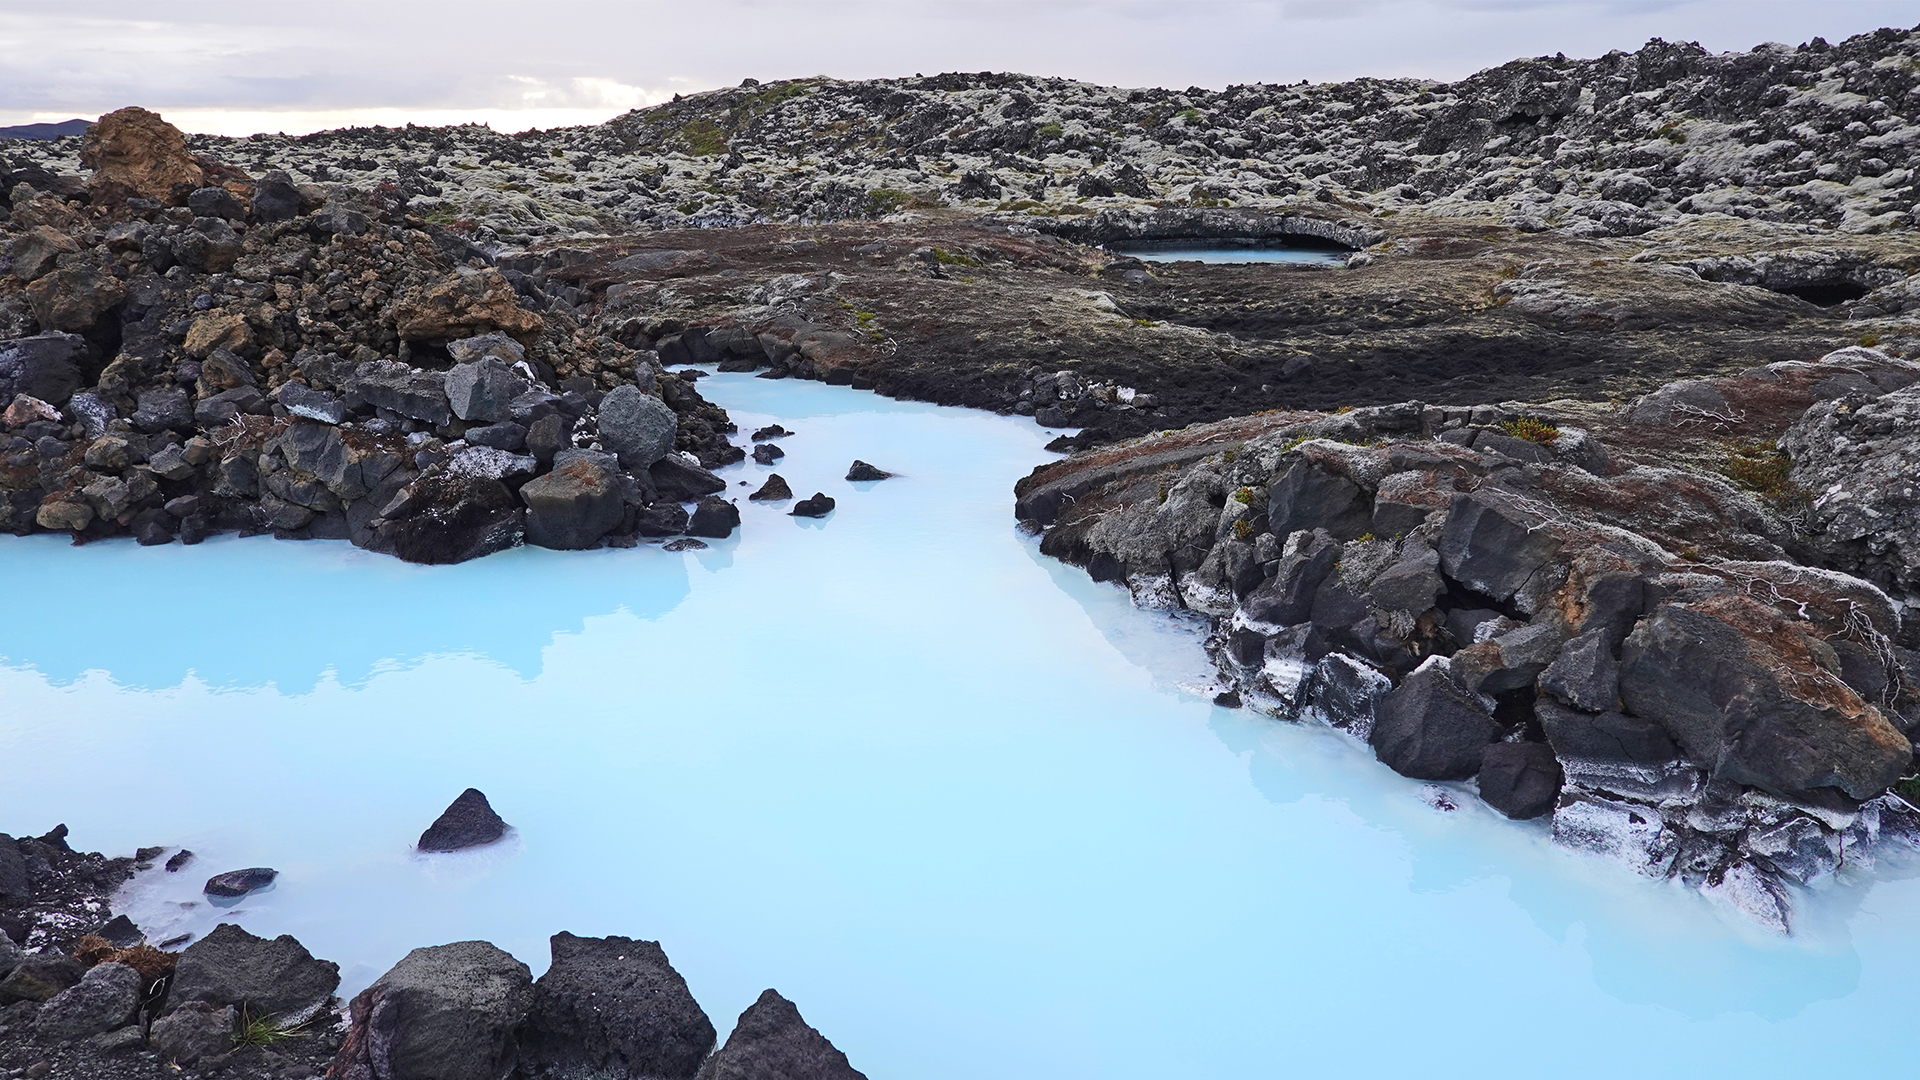 Blue_Lagoon_2_16_9